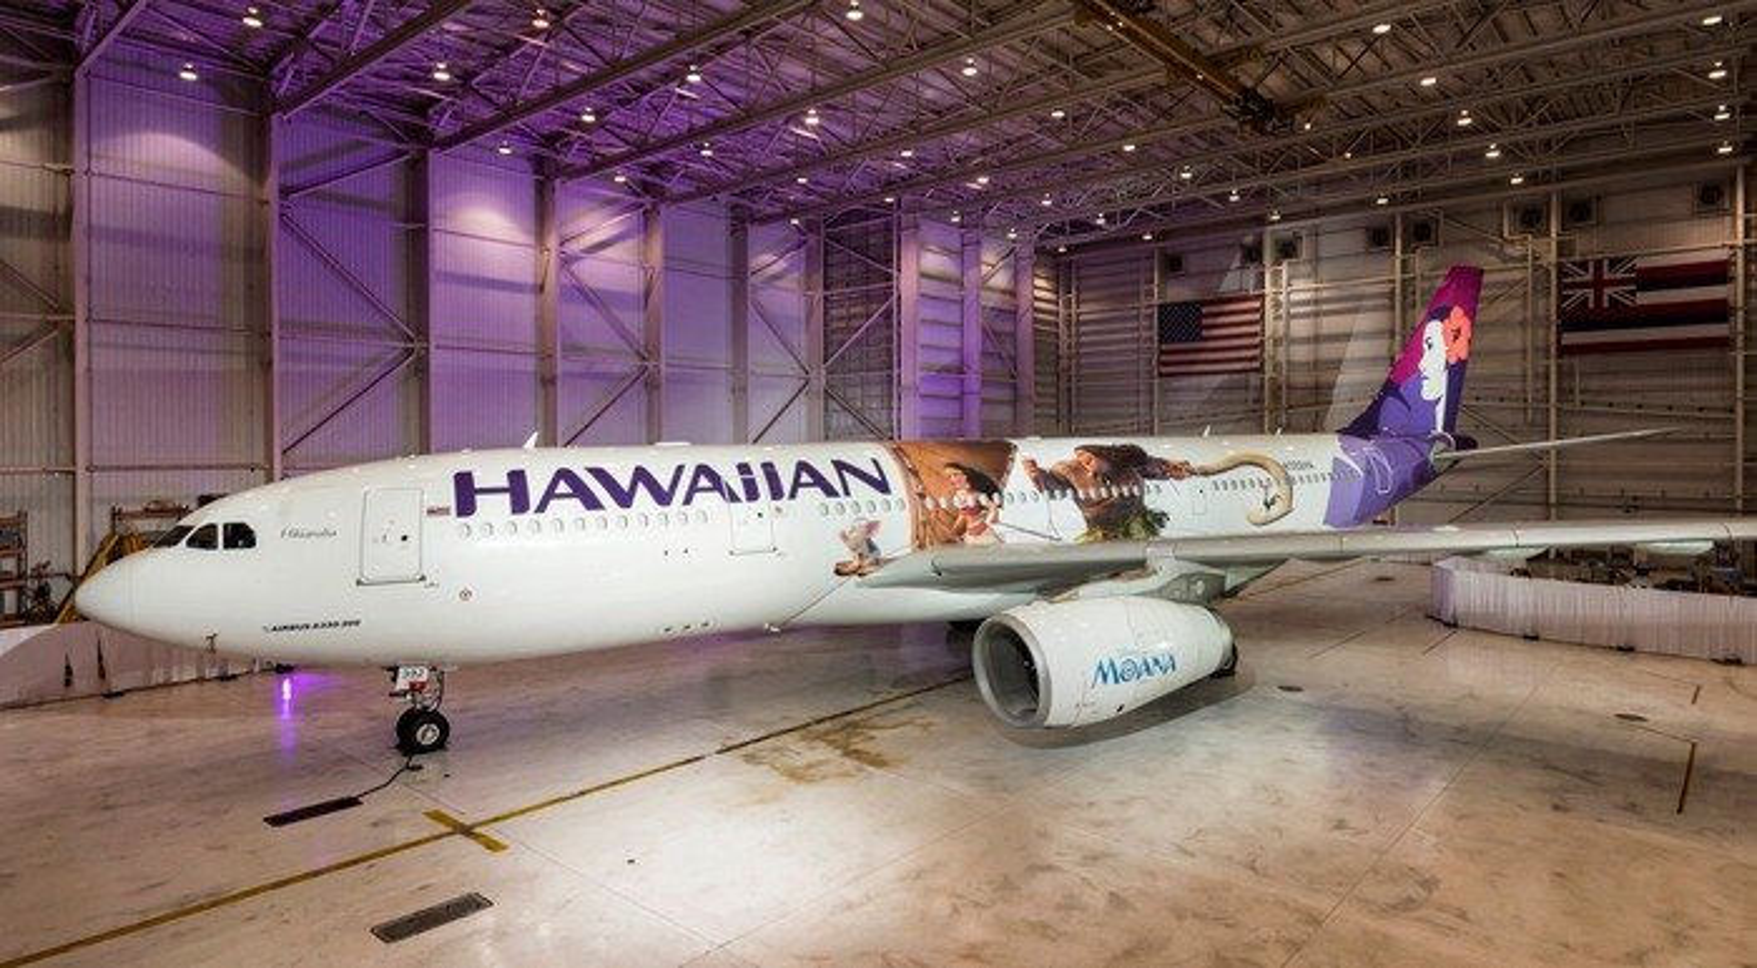 Narrow-body aircraft with Hawaiian logo and markings, in a hangar.